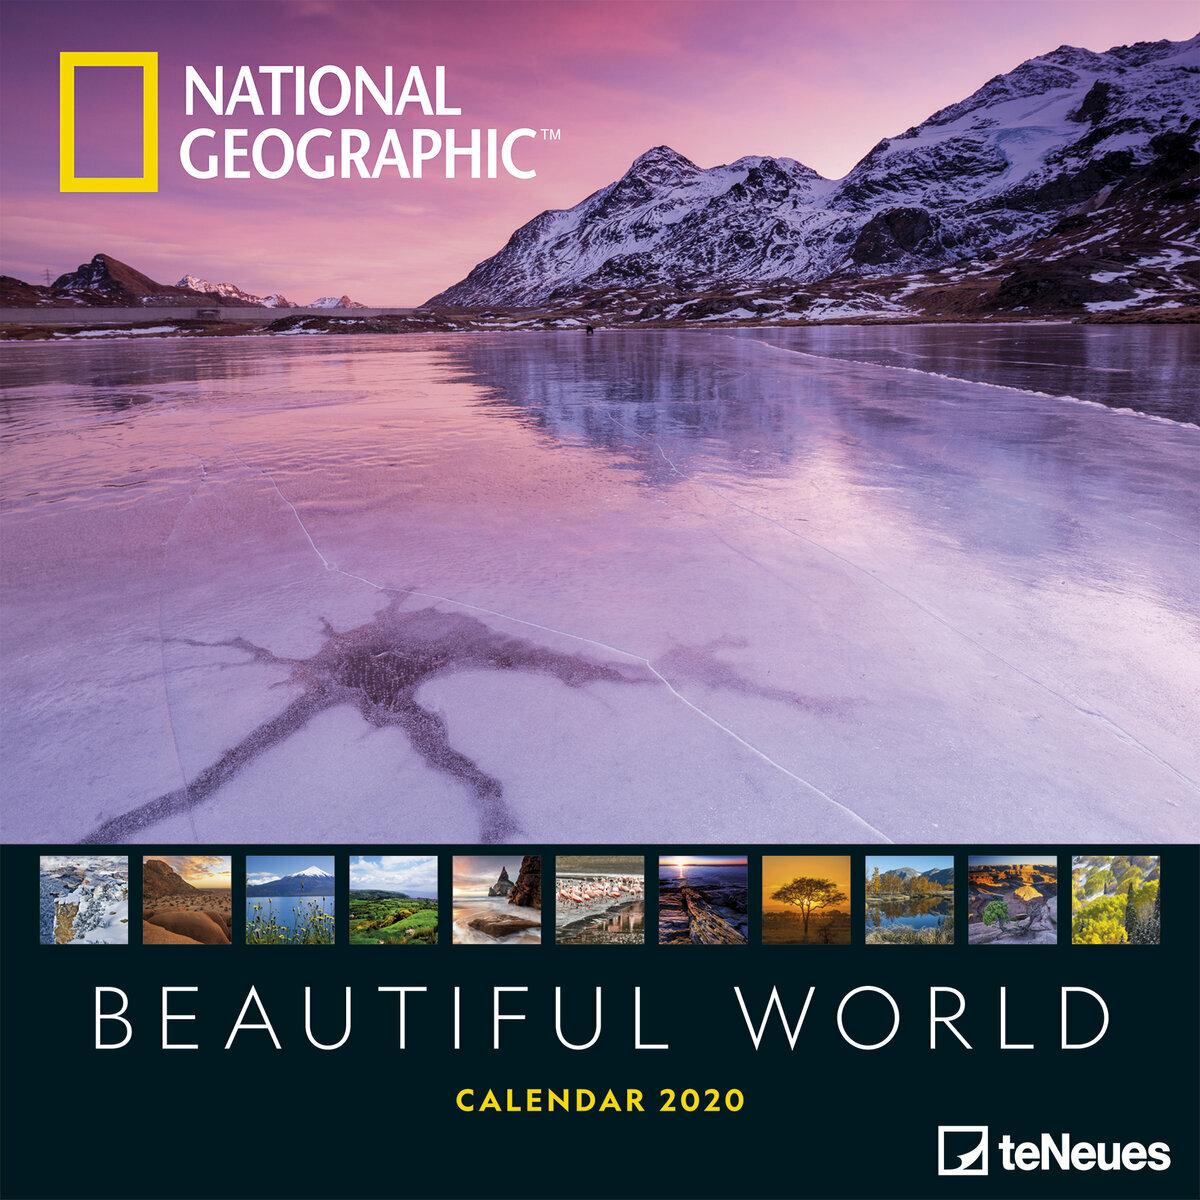 Calendrier National 2020.Calendrier 2020 National Geographic Le Monde Et Sa Beaute